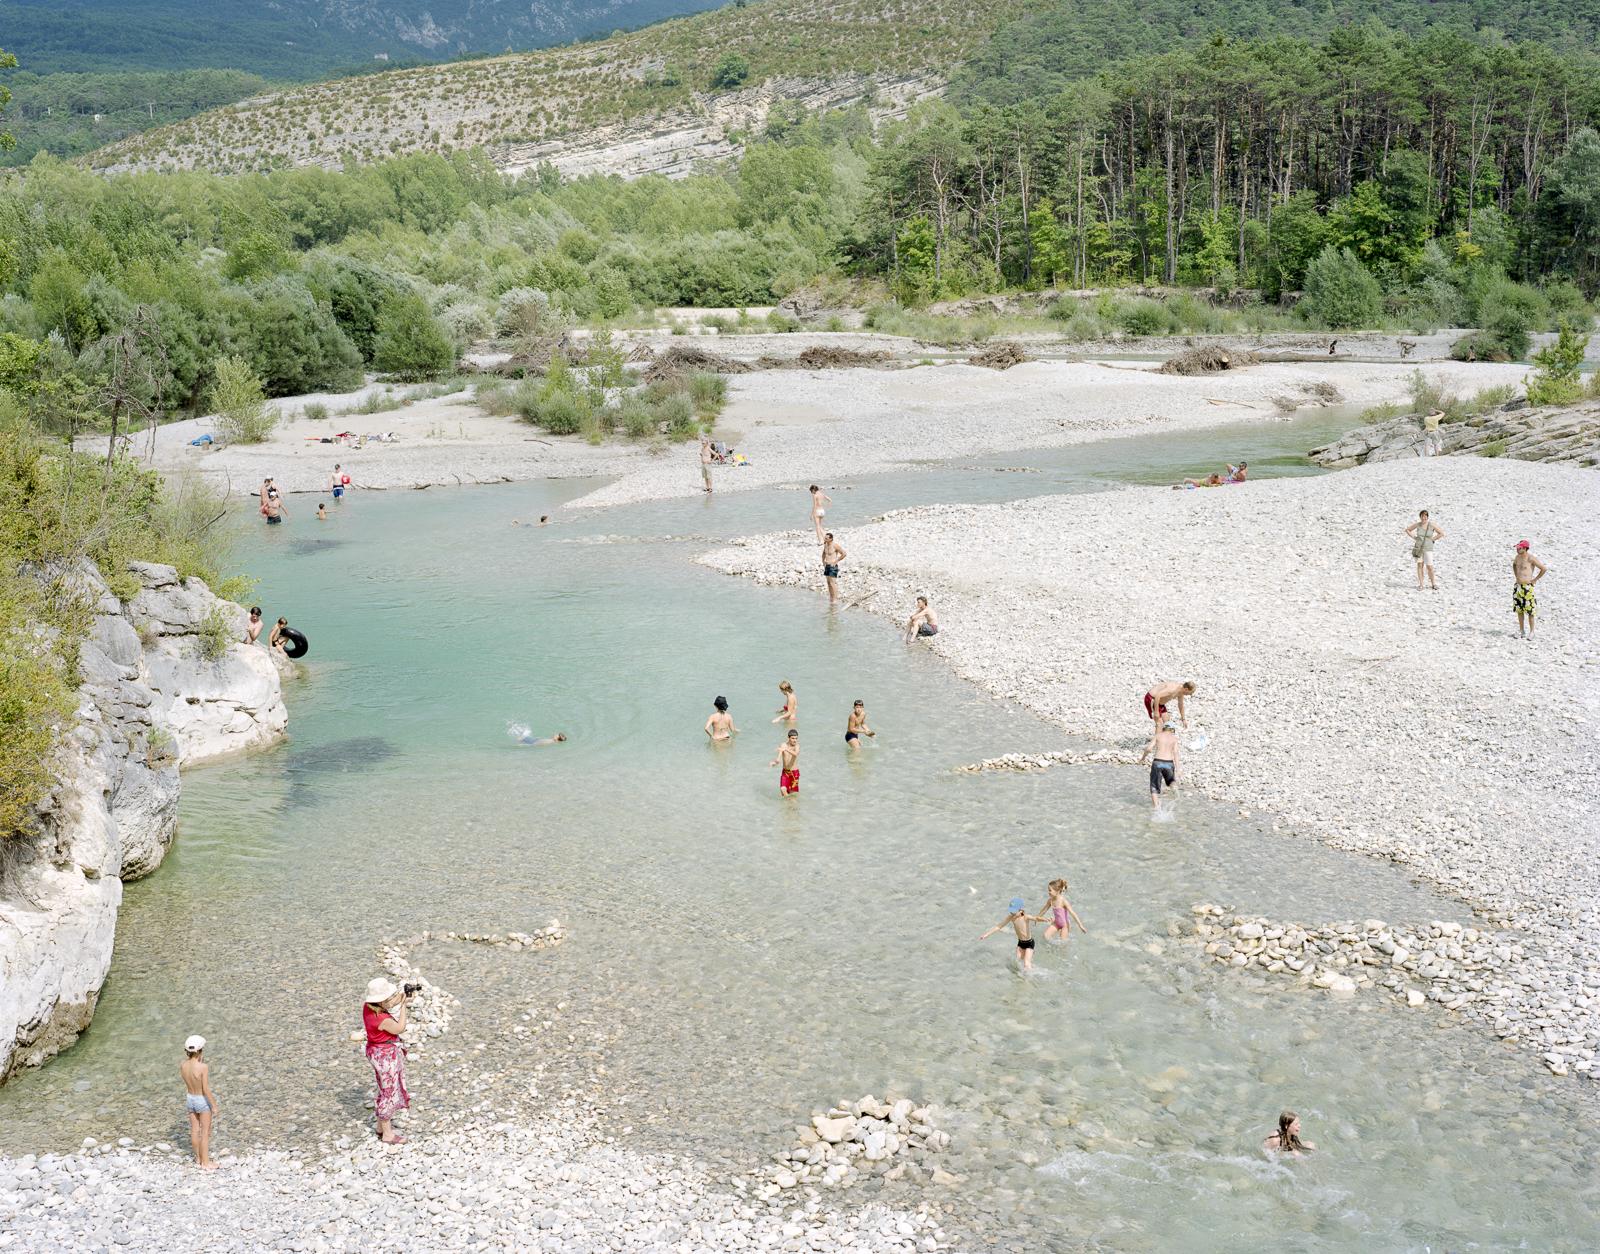 Ardèche river, France